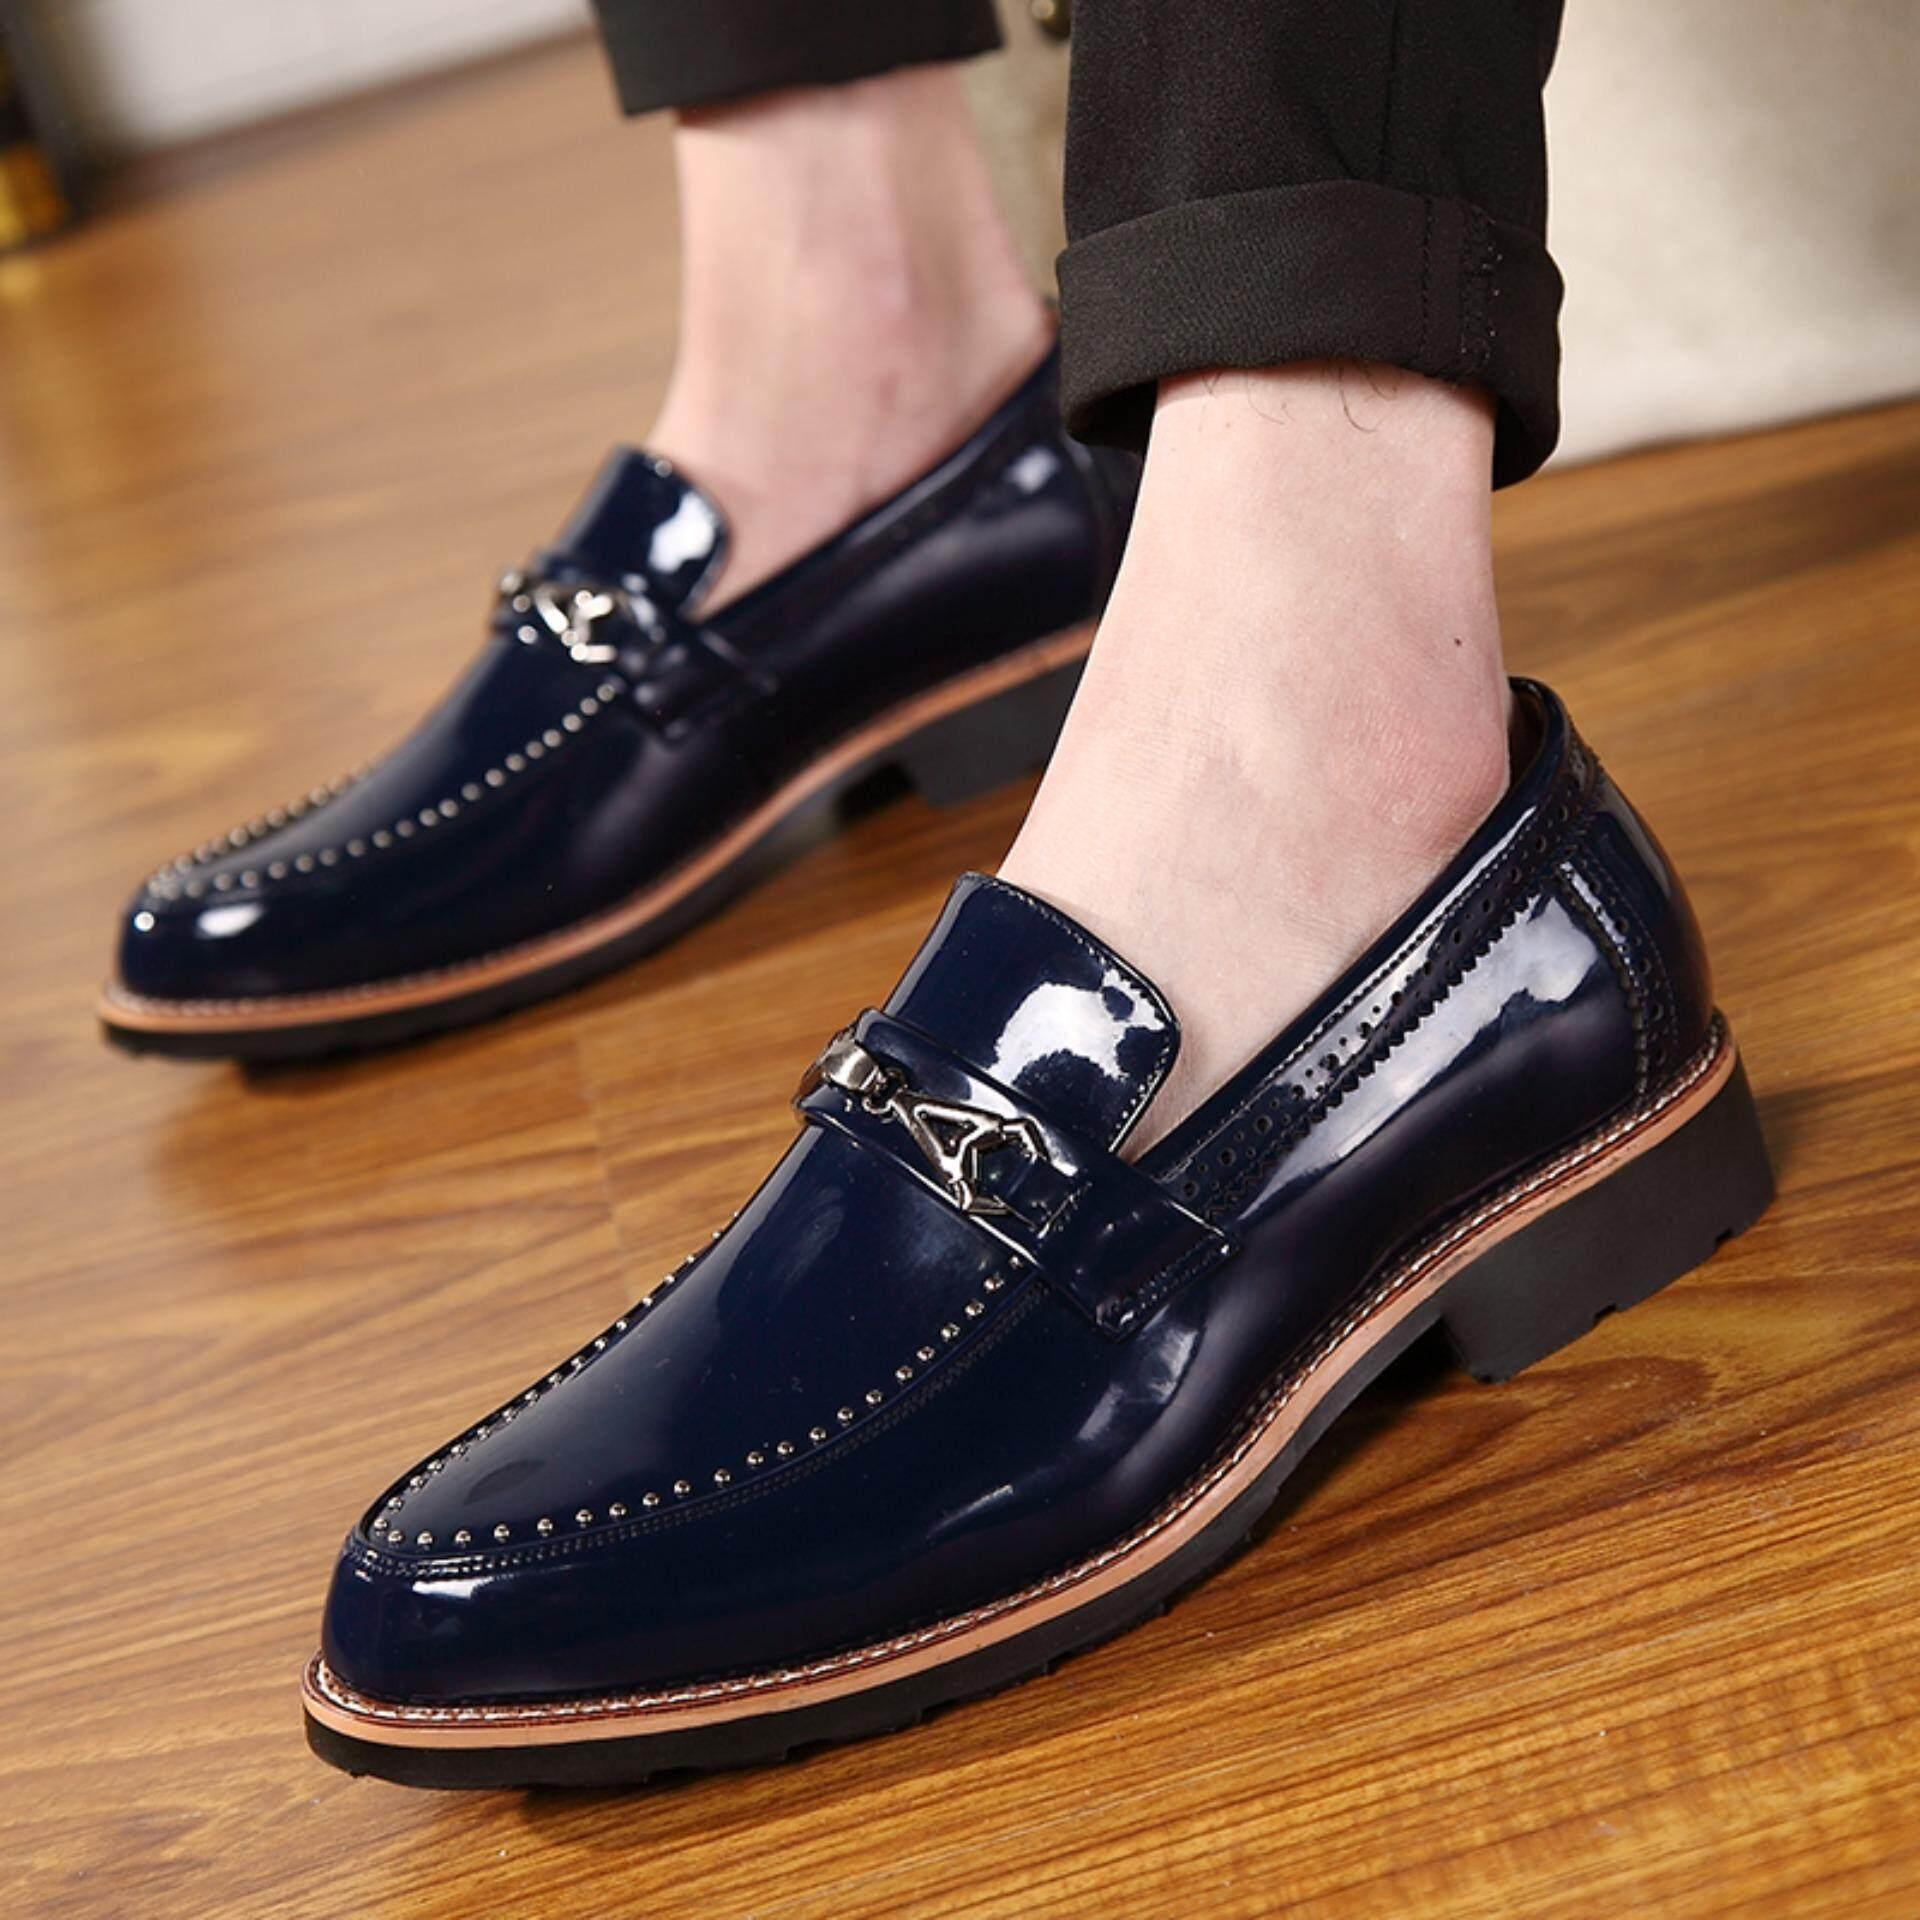 Detail Gambar Yealon Kasut Lelaki Kasut Kulit Hitam Pria Sepatu Kasual Pria  Formal Pernikahan Pary Sepatu 7a0c368215